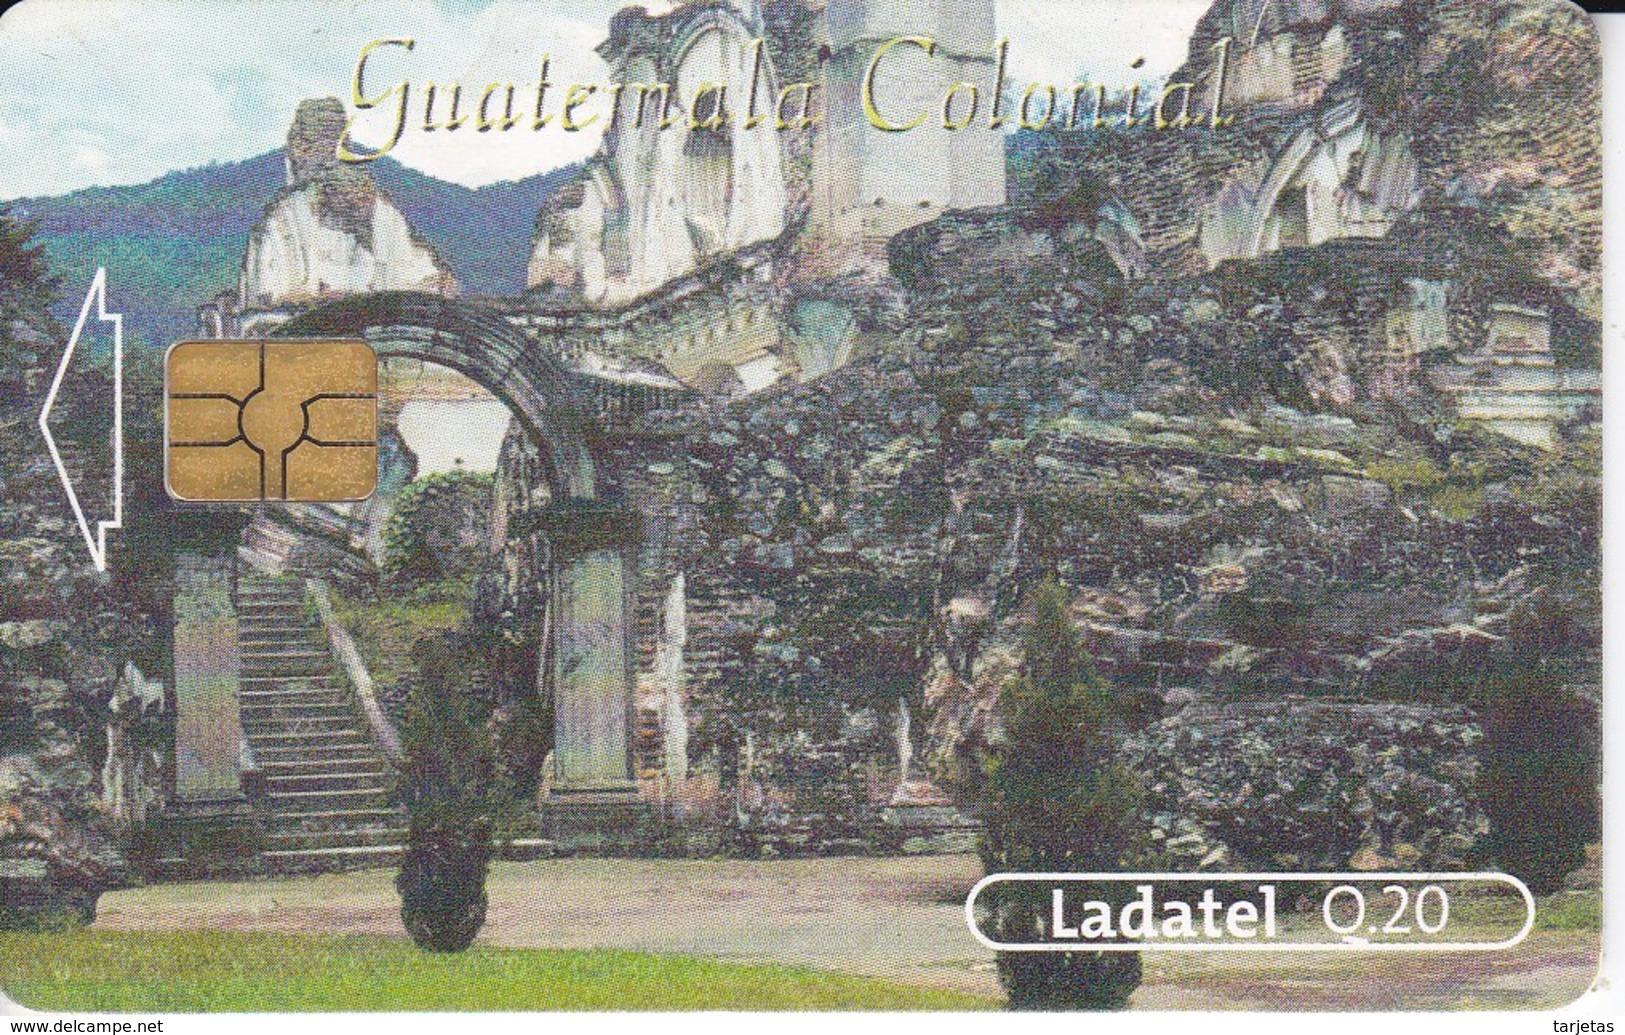 TARJETA DE GUATEMALA DE LA IGLESIA Y CONVENTO DE LA RECOLECCION CHIP NEGRO (LADATEL) - Guatemala